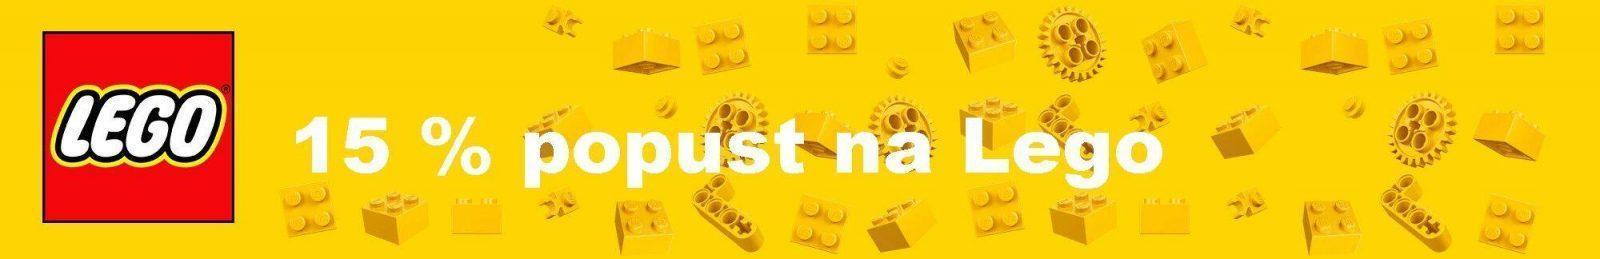 LEGO-Header-2